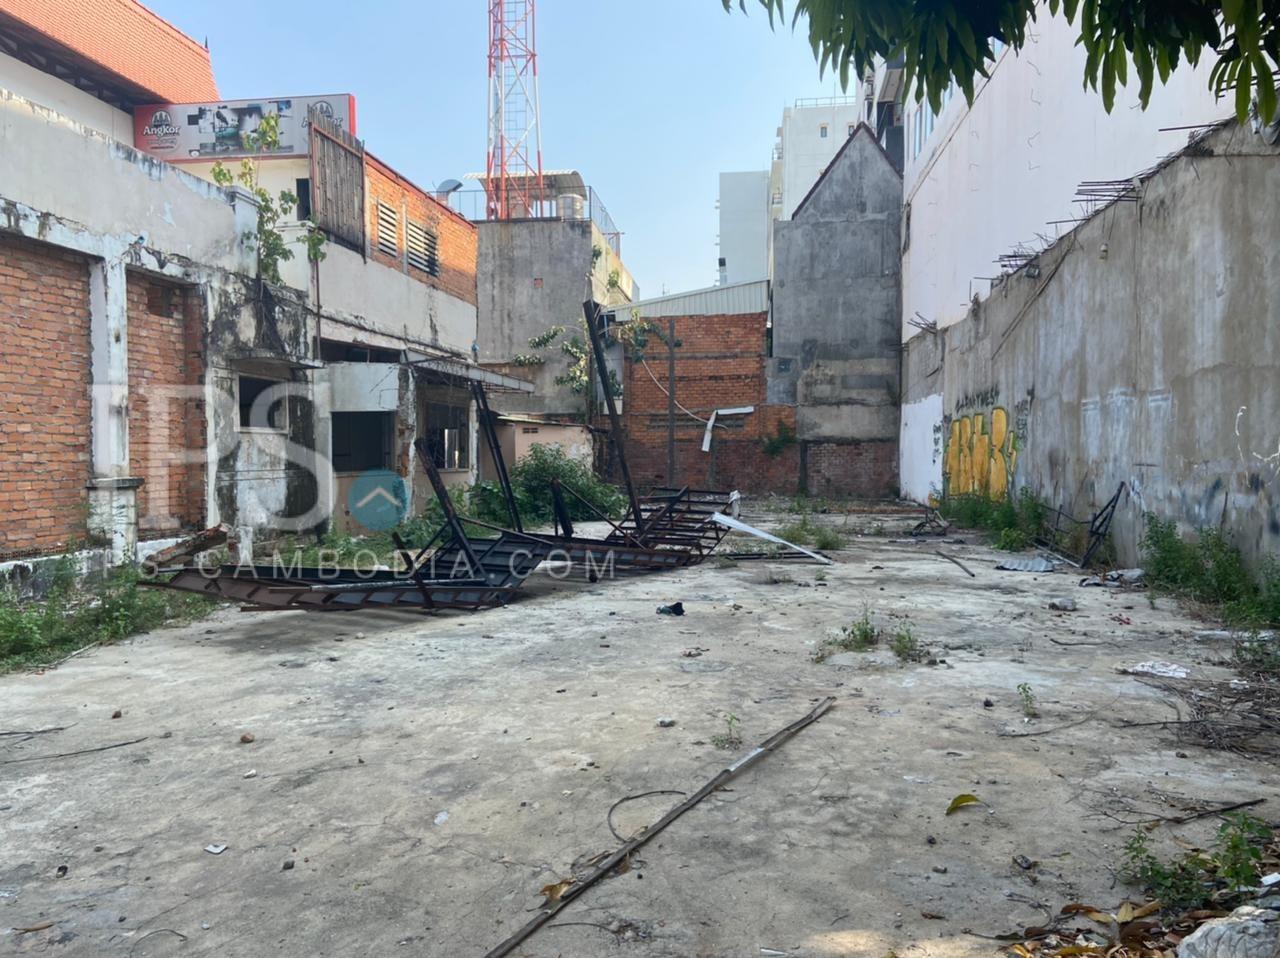 807 Sqm Land For Sale - BKK1, Phnom Penh